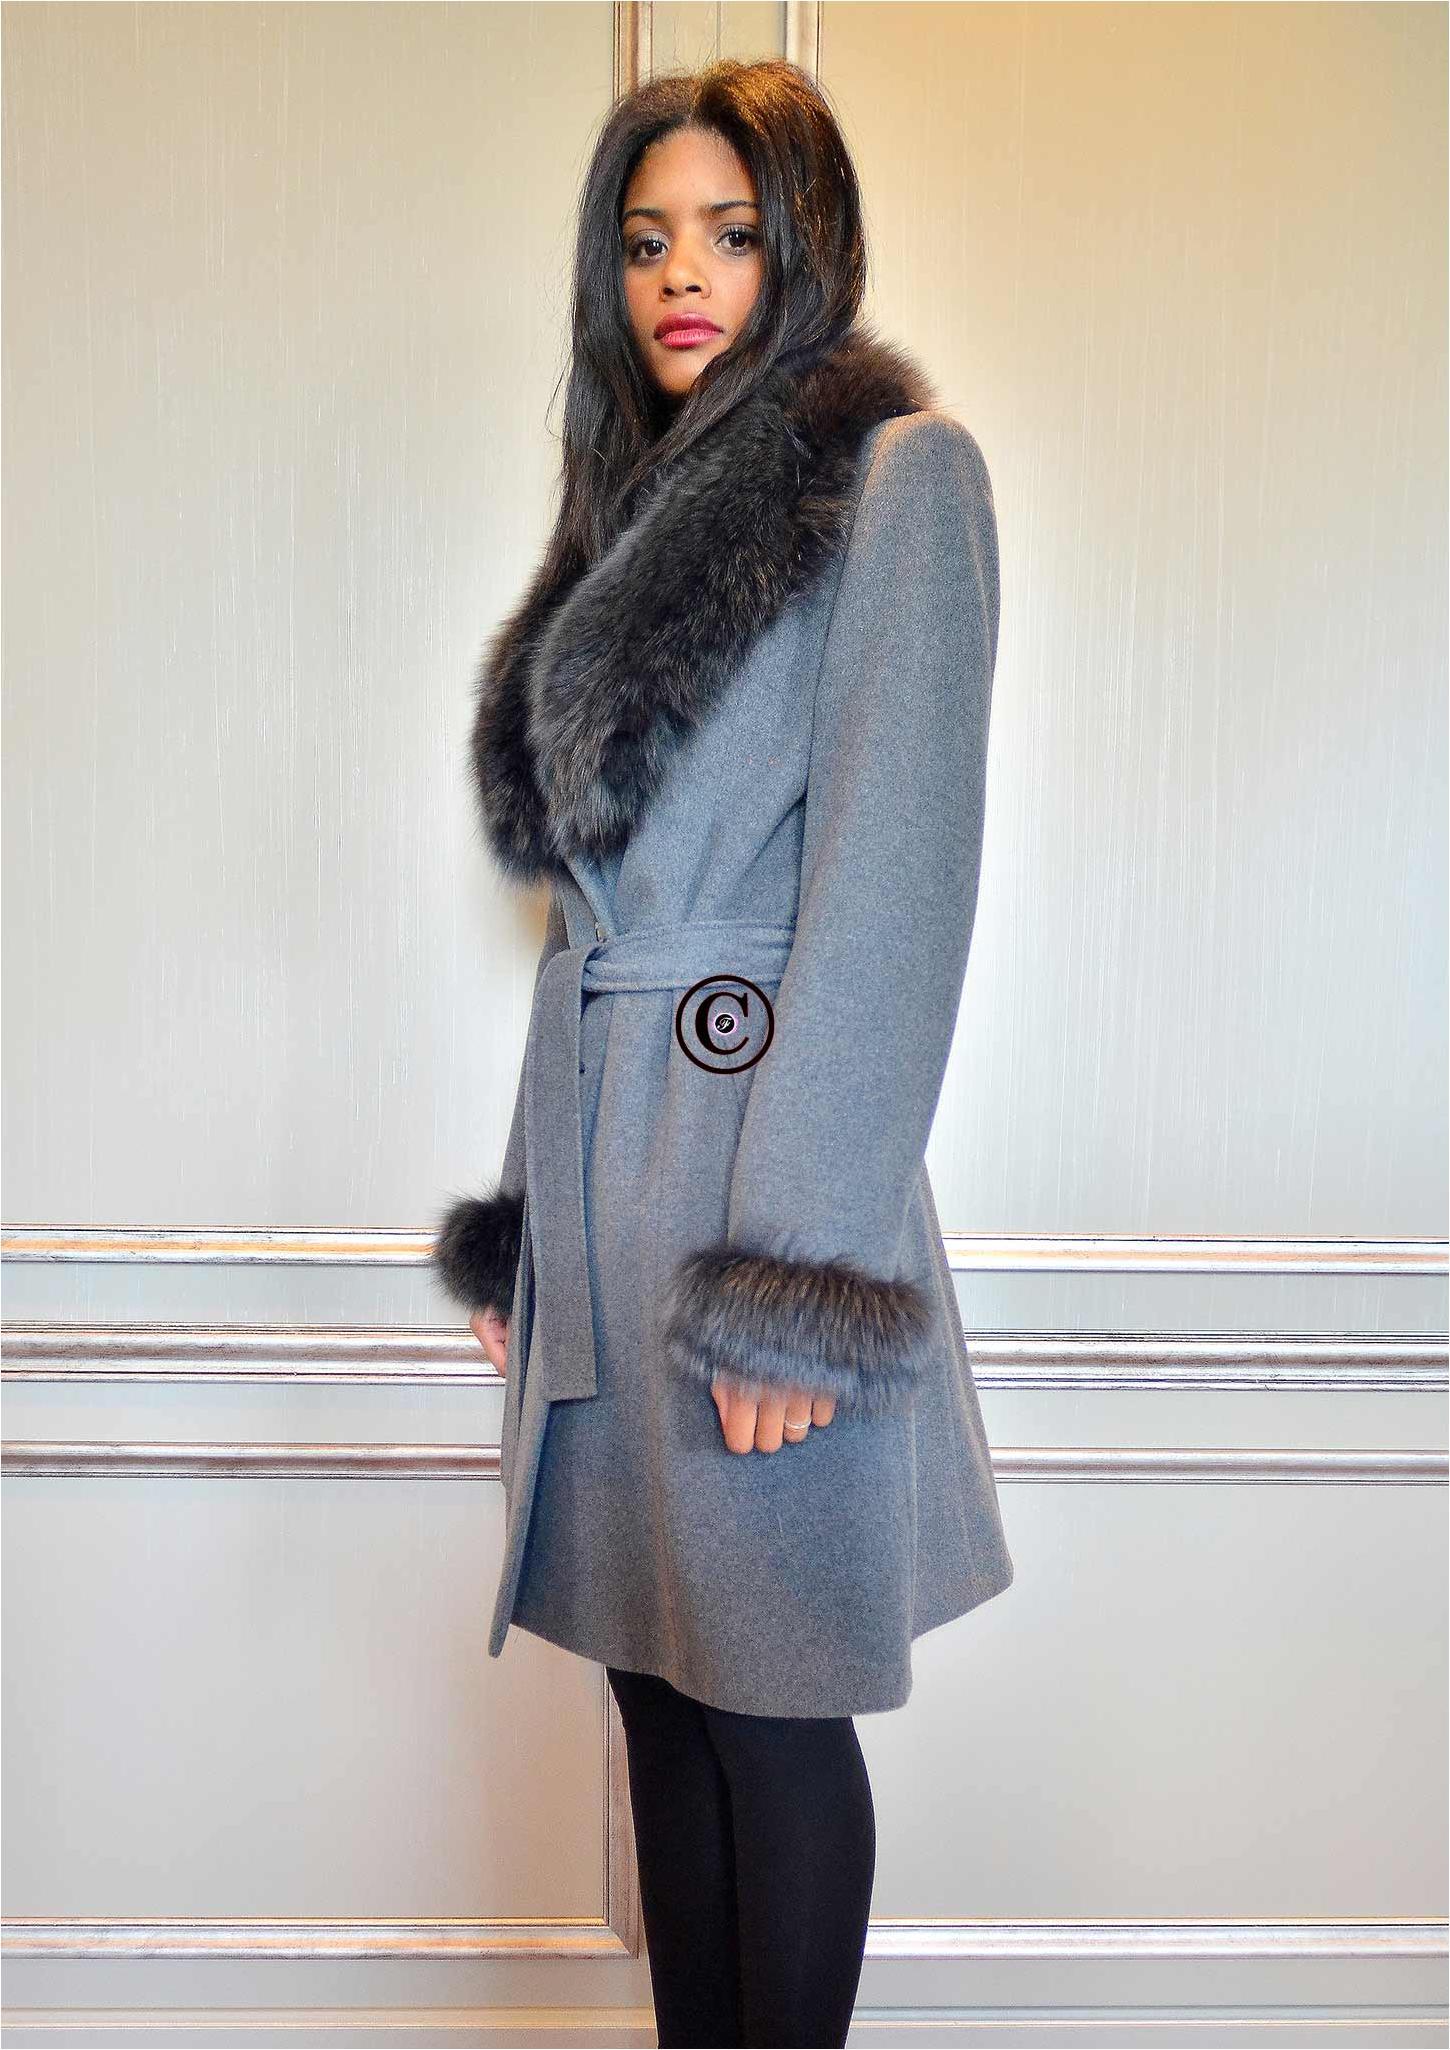 manteau gris elysa fourrure de renard. Black Bedroom Furniture Sets. Home Design Ideas